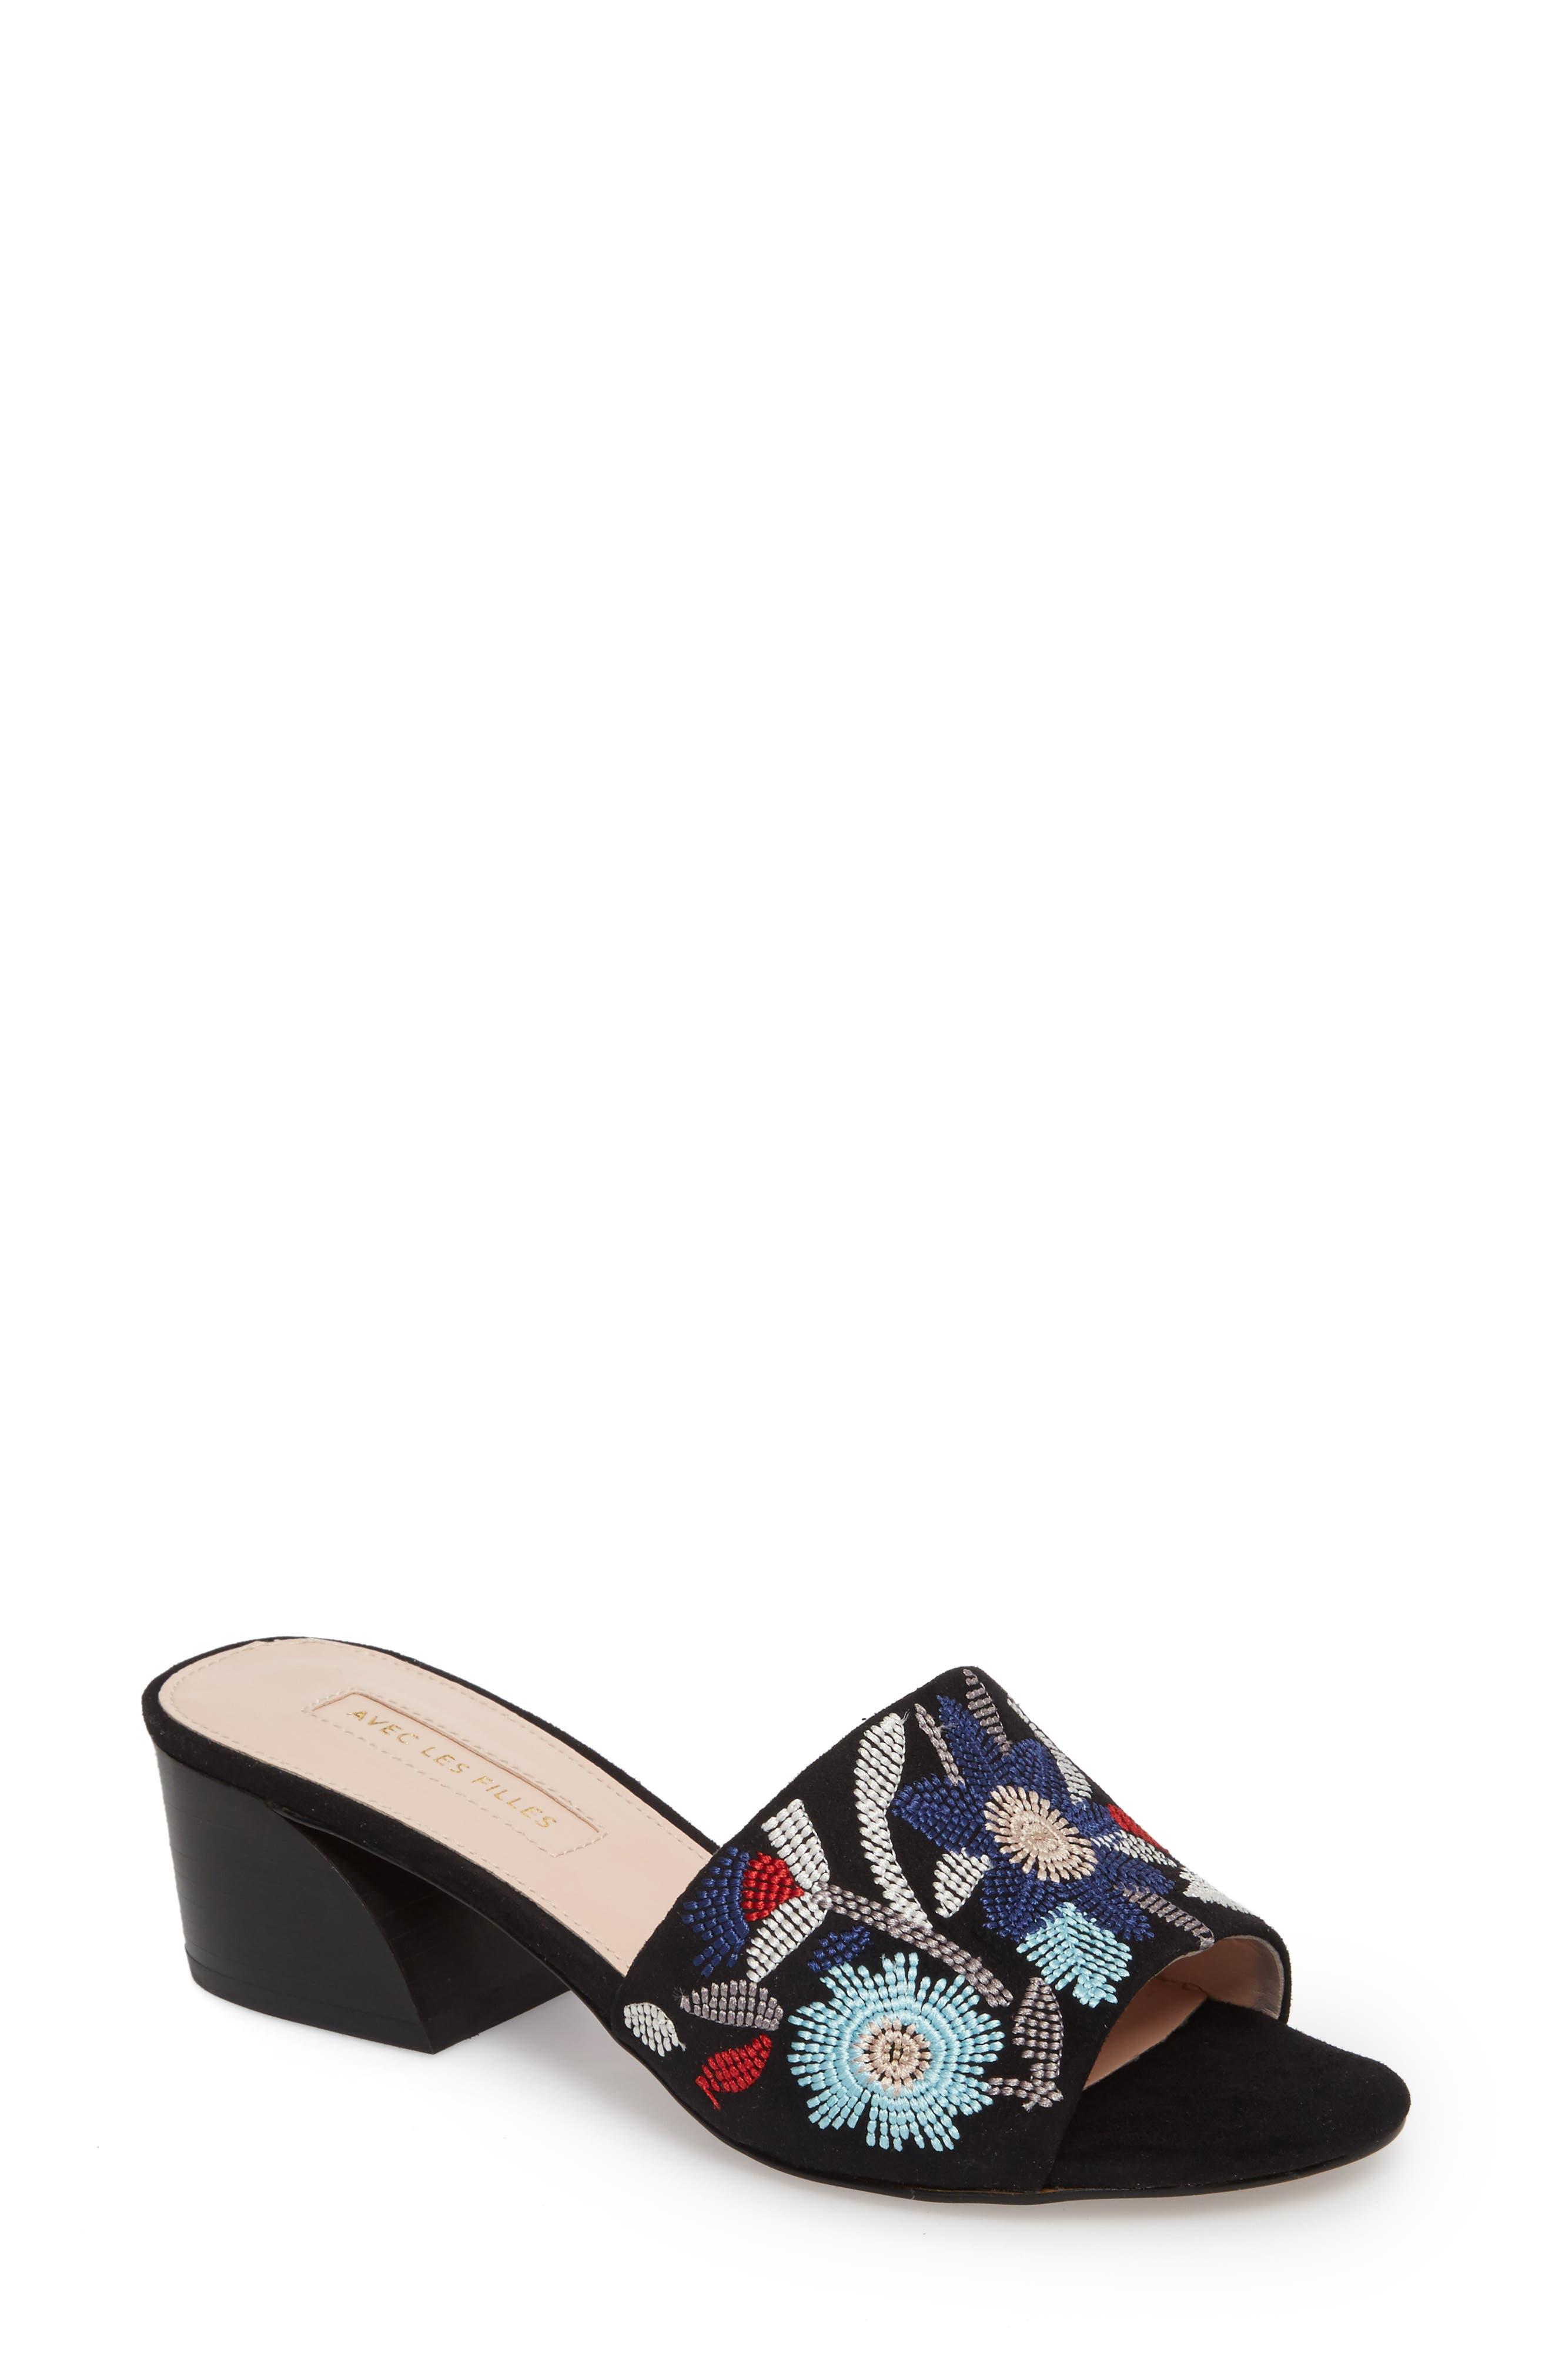 Sloane Sandal,                         Main,                         color, Black Multi Fabric